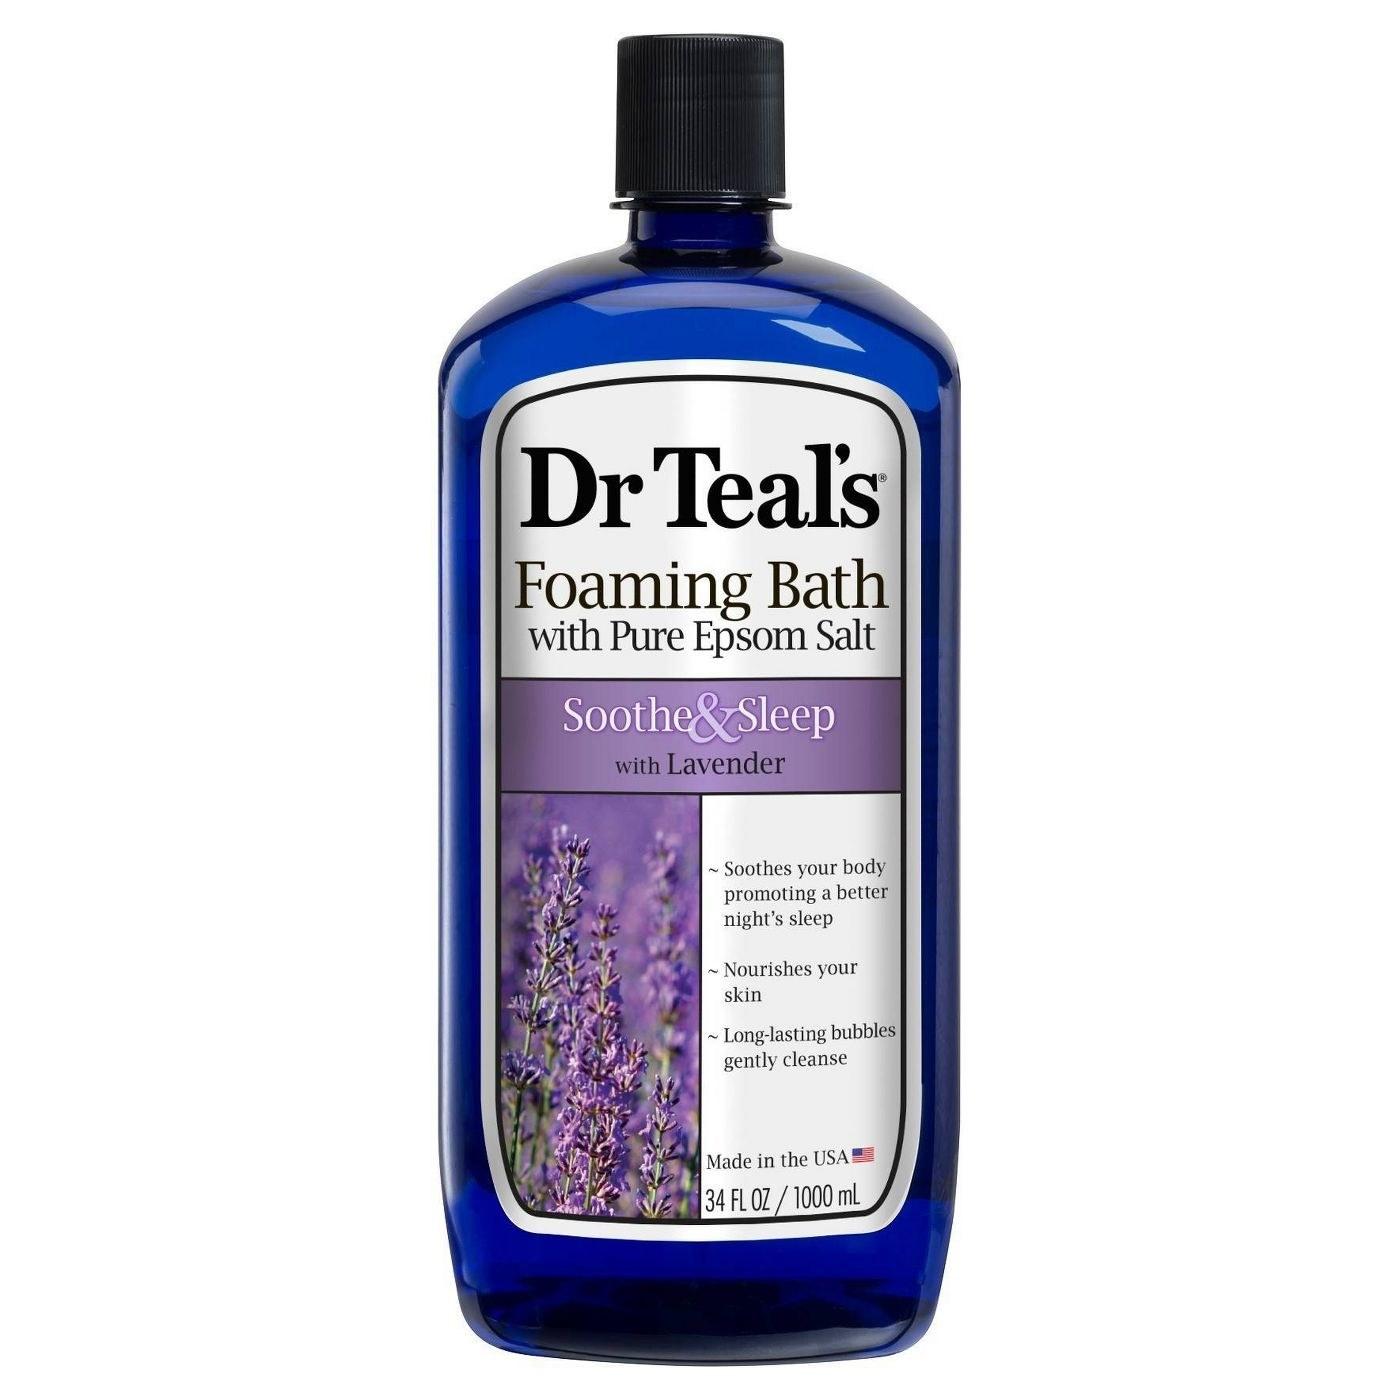 Dr. Teal's foaming bath bottle